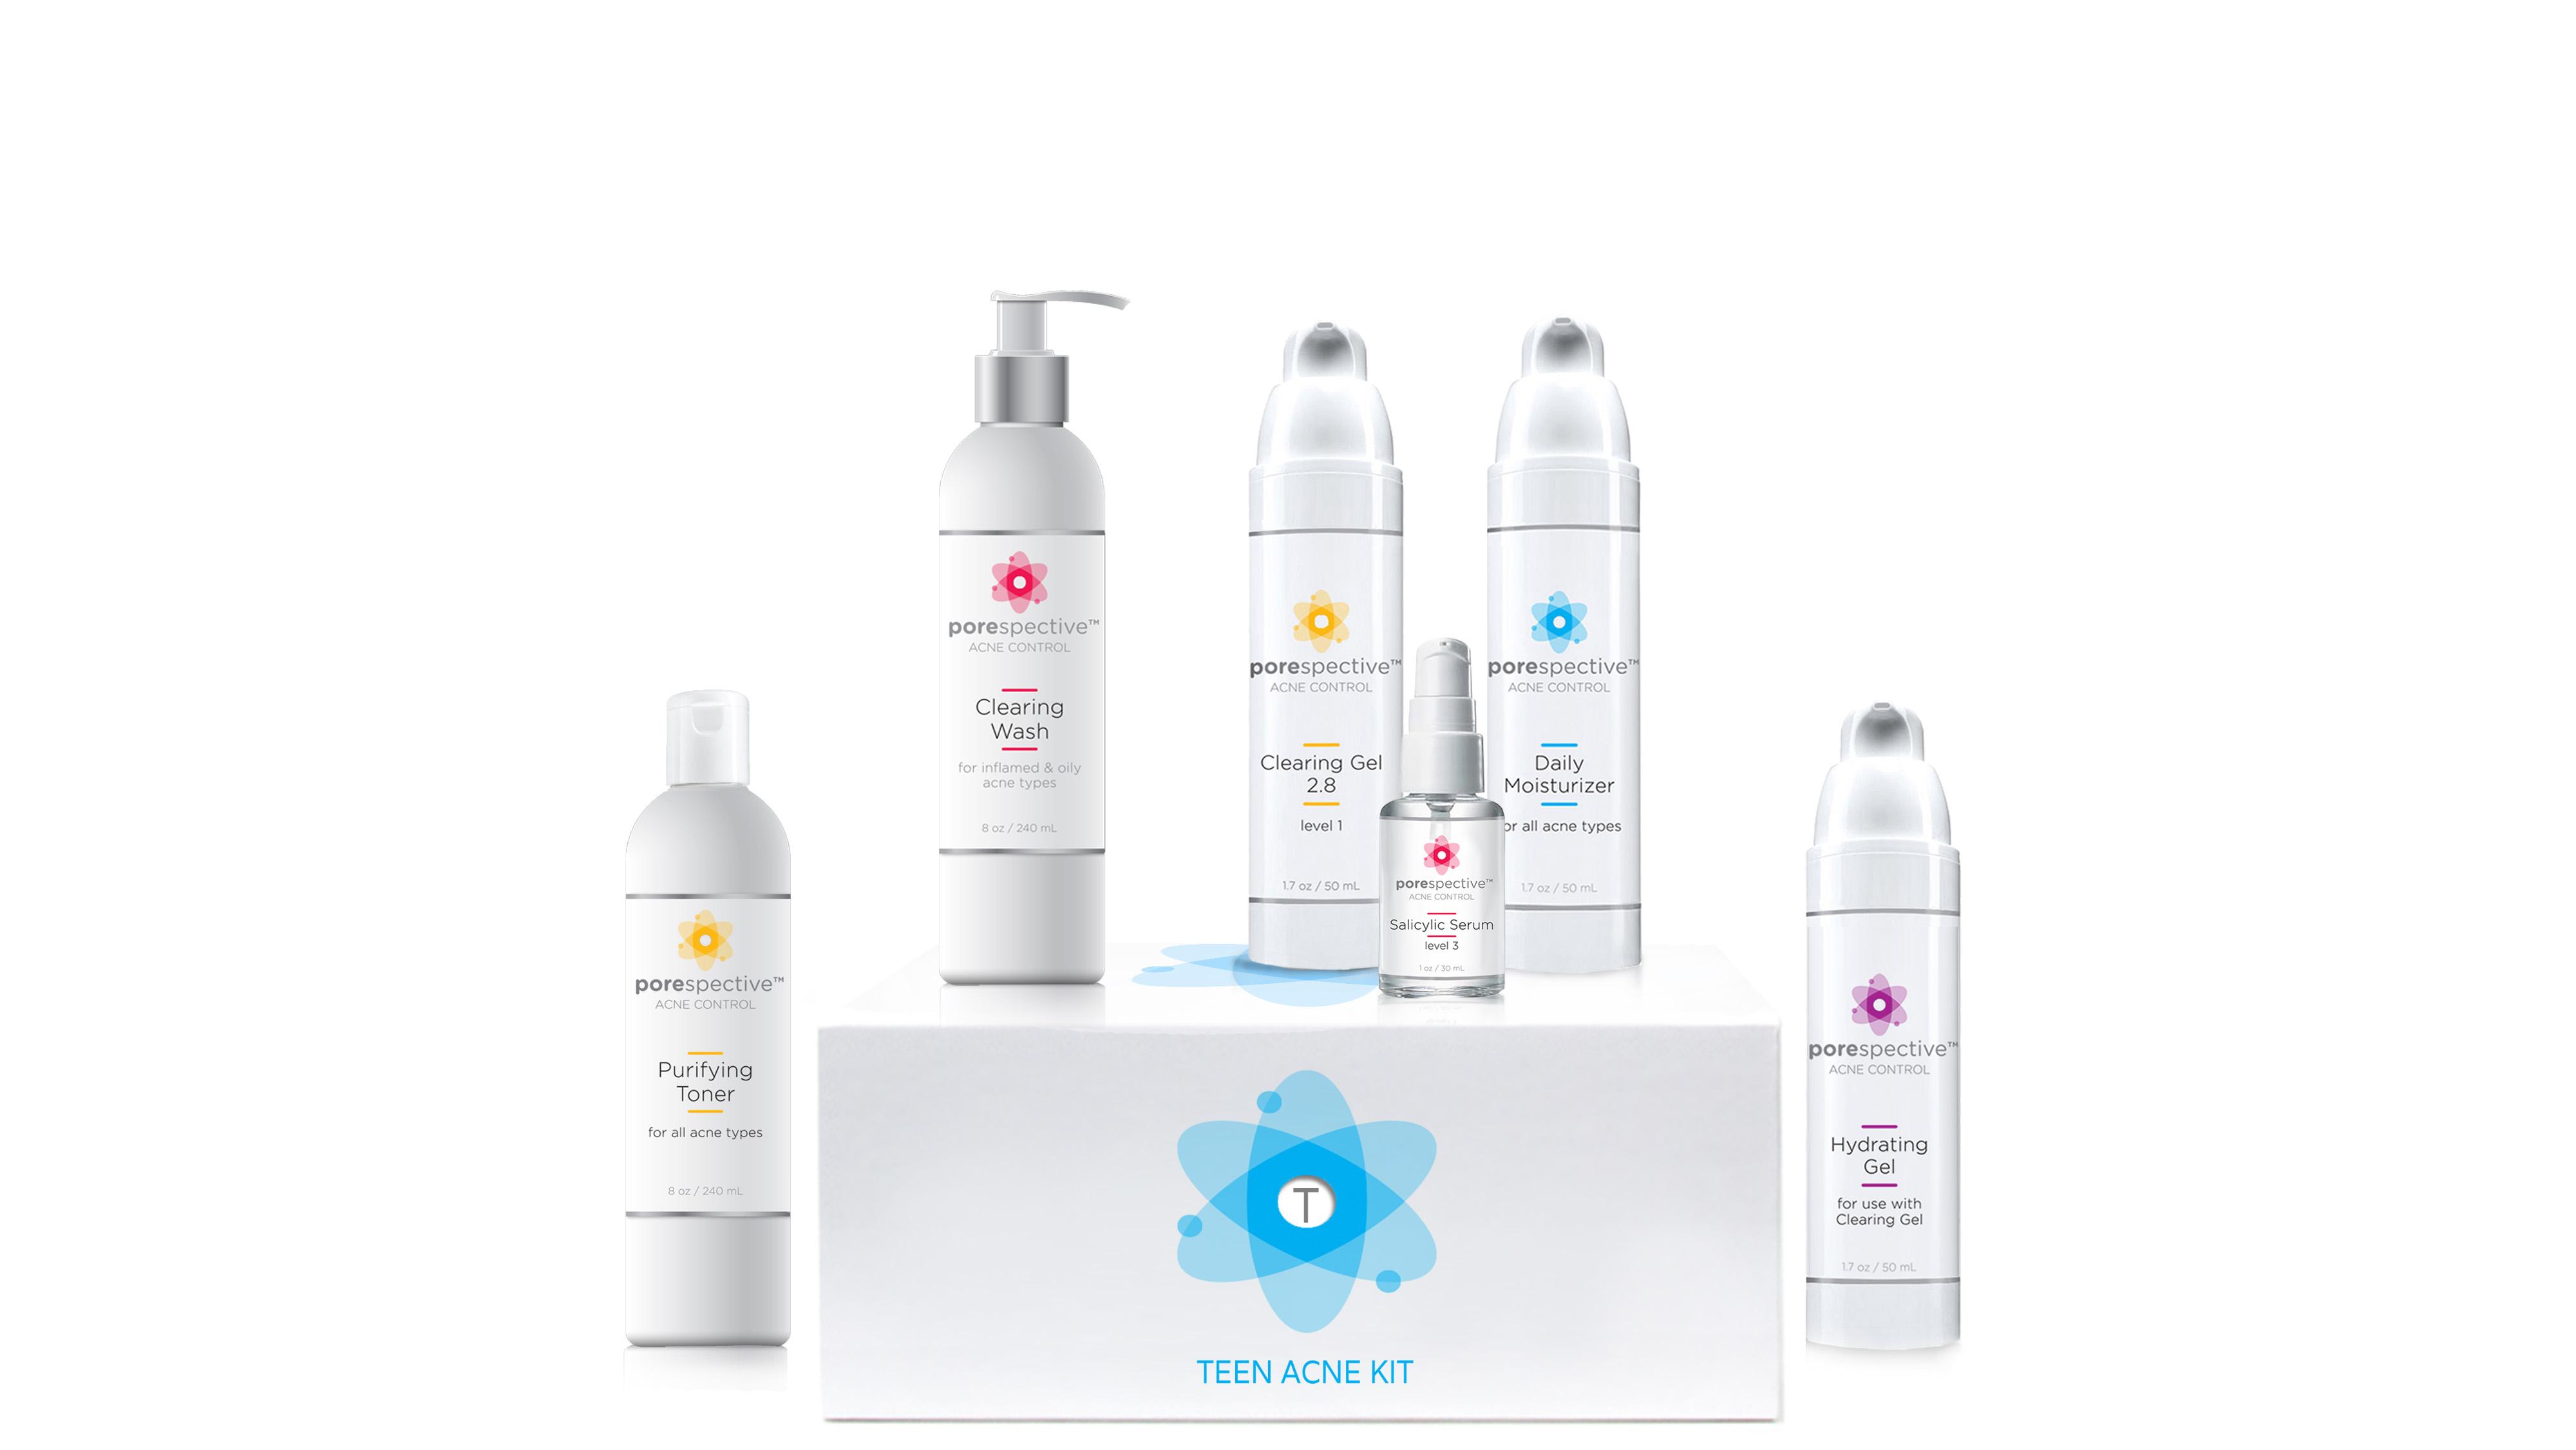 POREspective acne kit formulated for teen acne